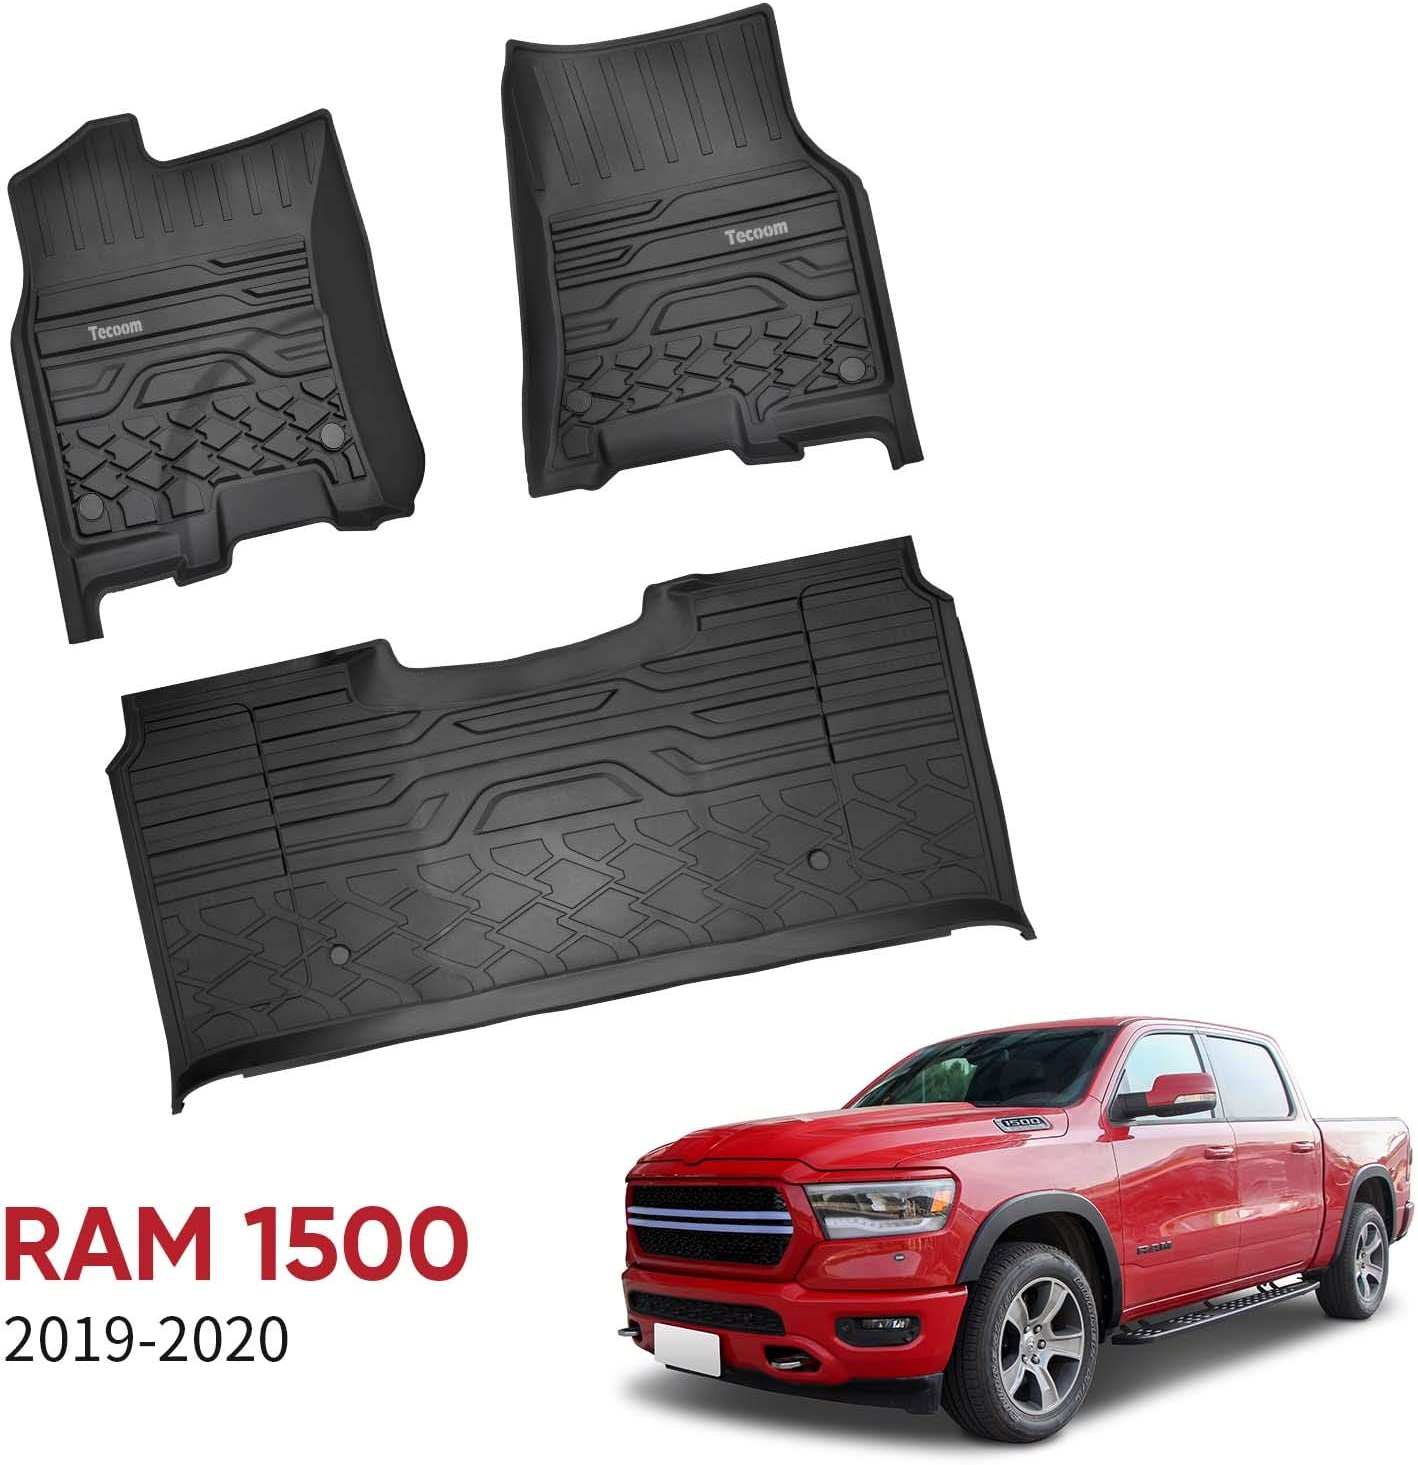 Tecoom Floor Mats Front /& 2nd Seat Floor Liners Fits 2019-2020 Ram 1500 Crew Cab All Weather TPE